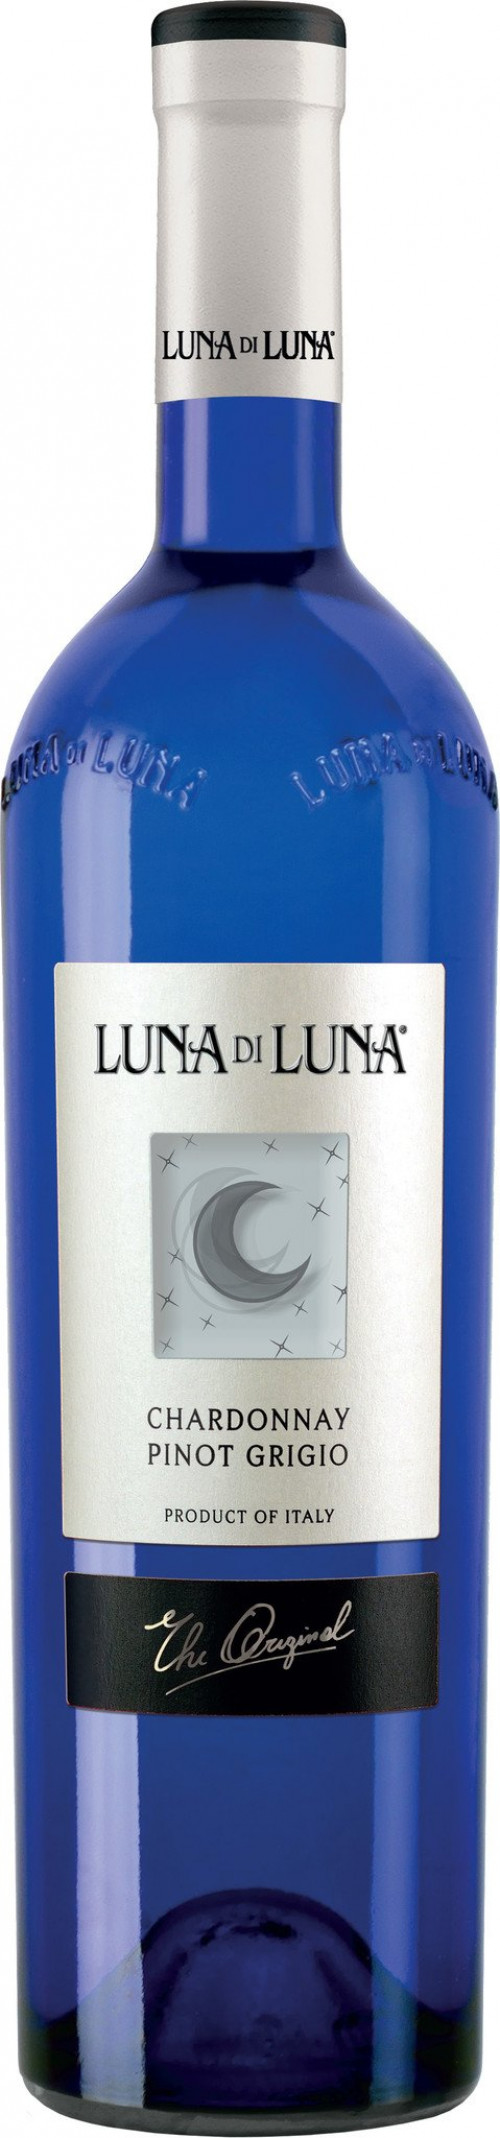 Luna Di Luna Chardonnay/Pinot Grigio 750Ml